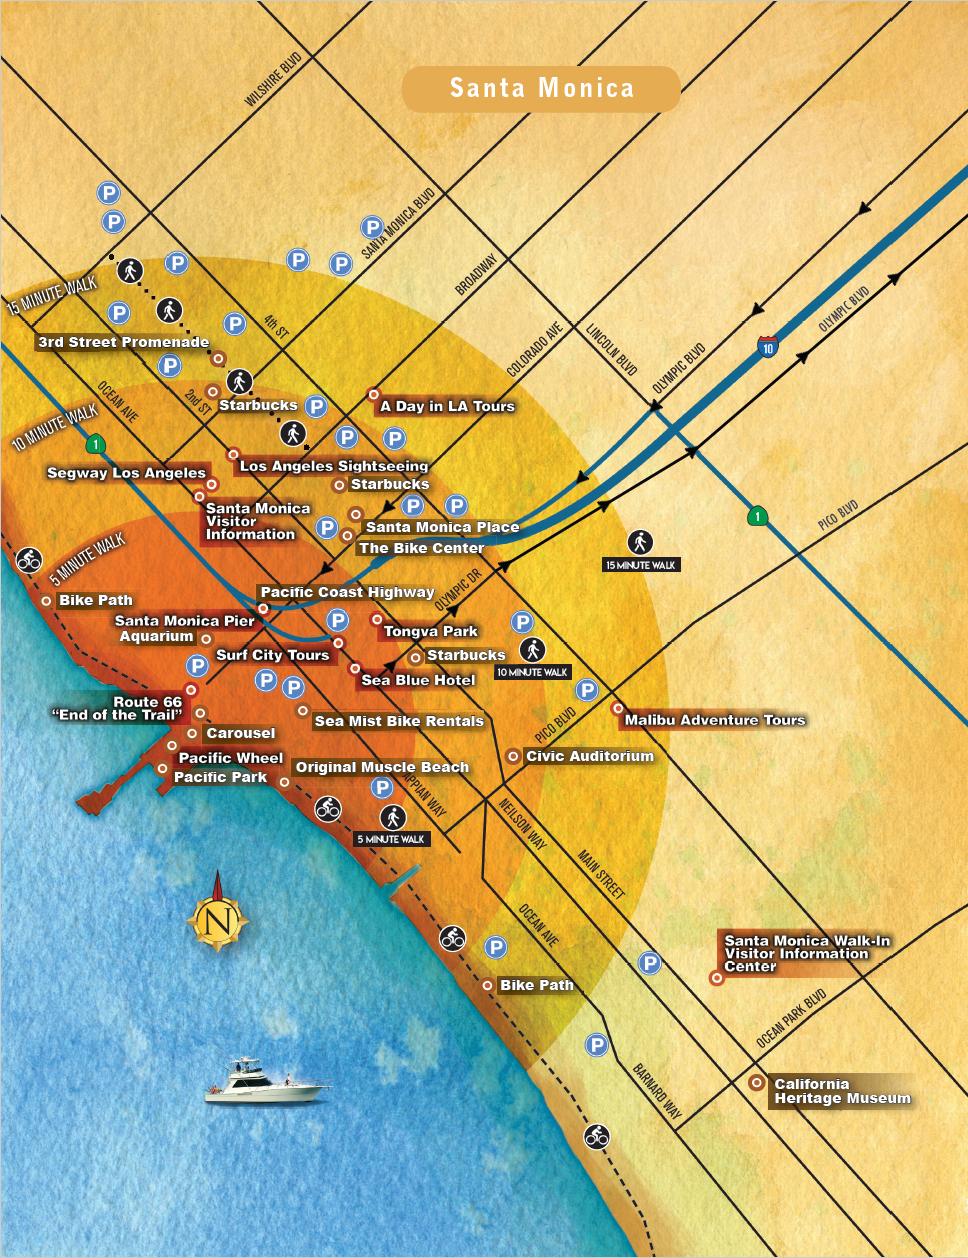 Santa Monica_web.png